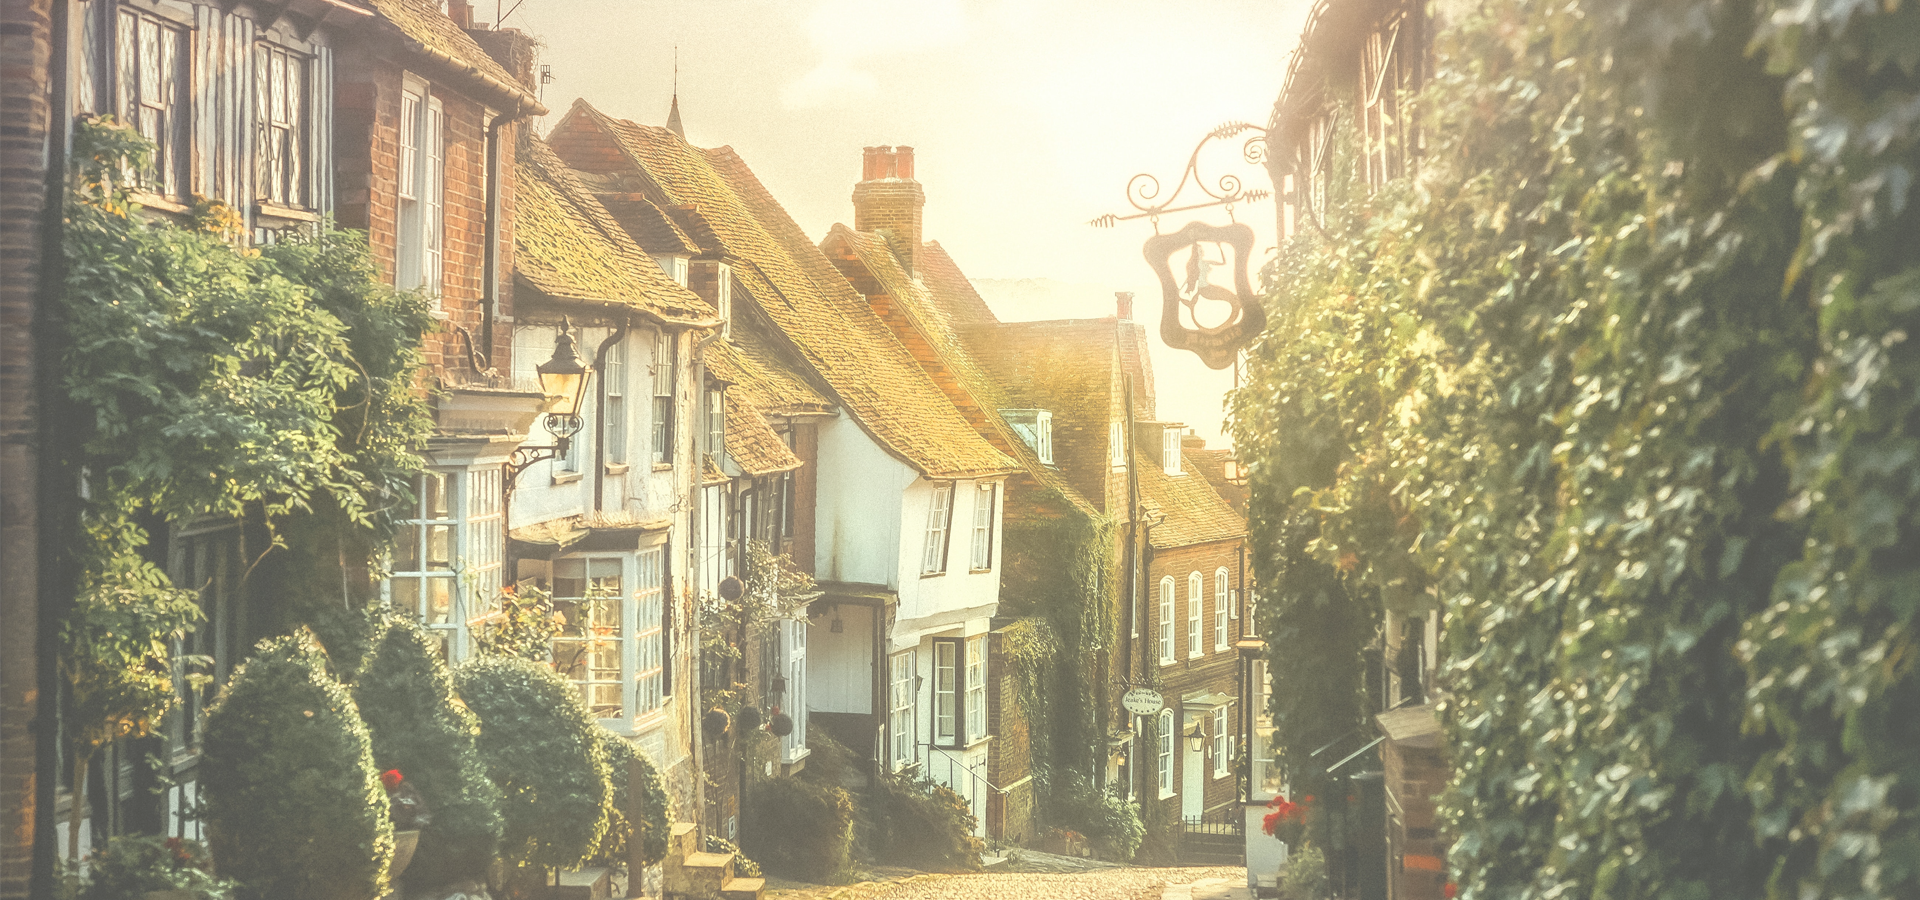 <b>Rye, East Sussex, England, Great Britain</b>